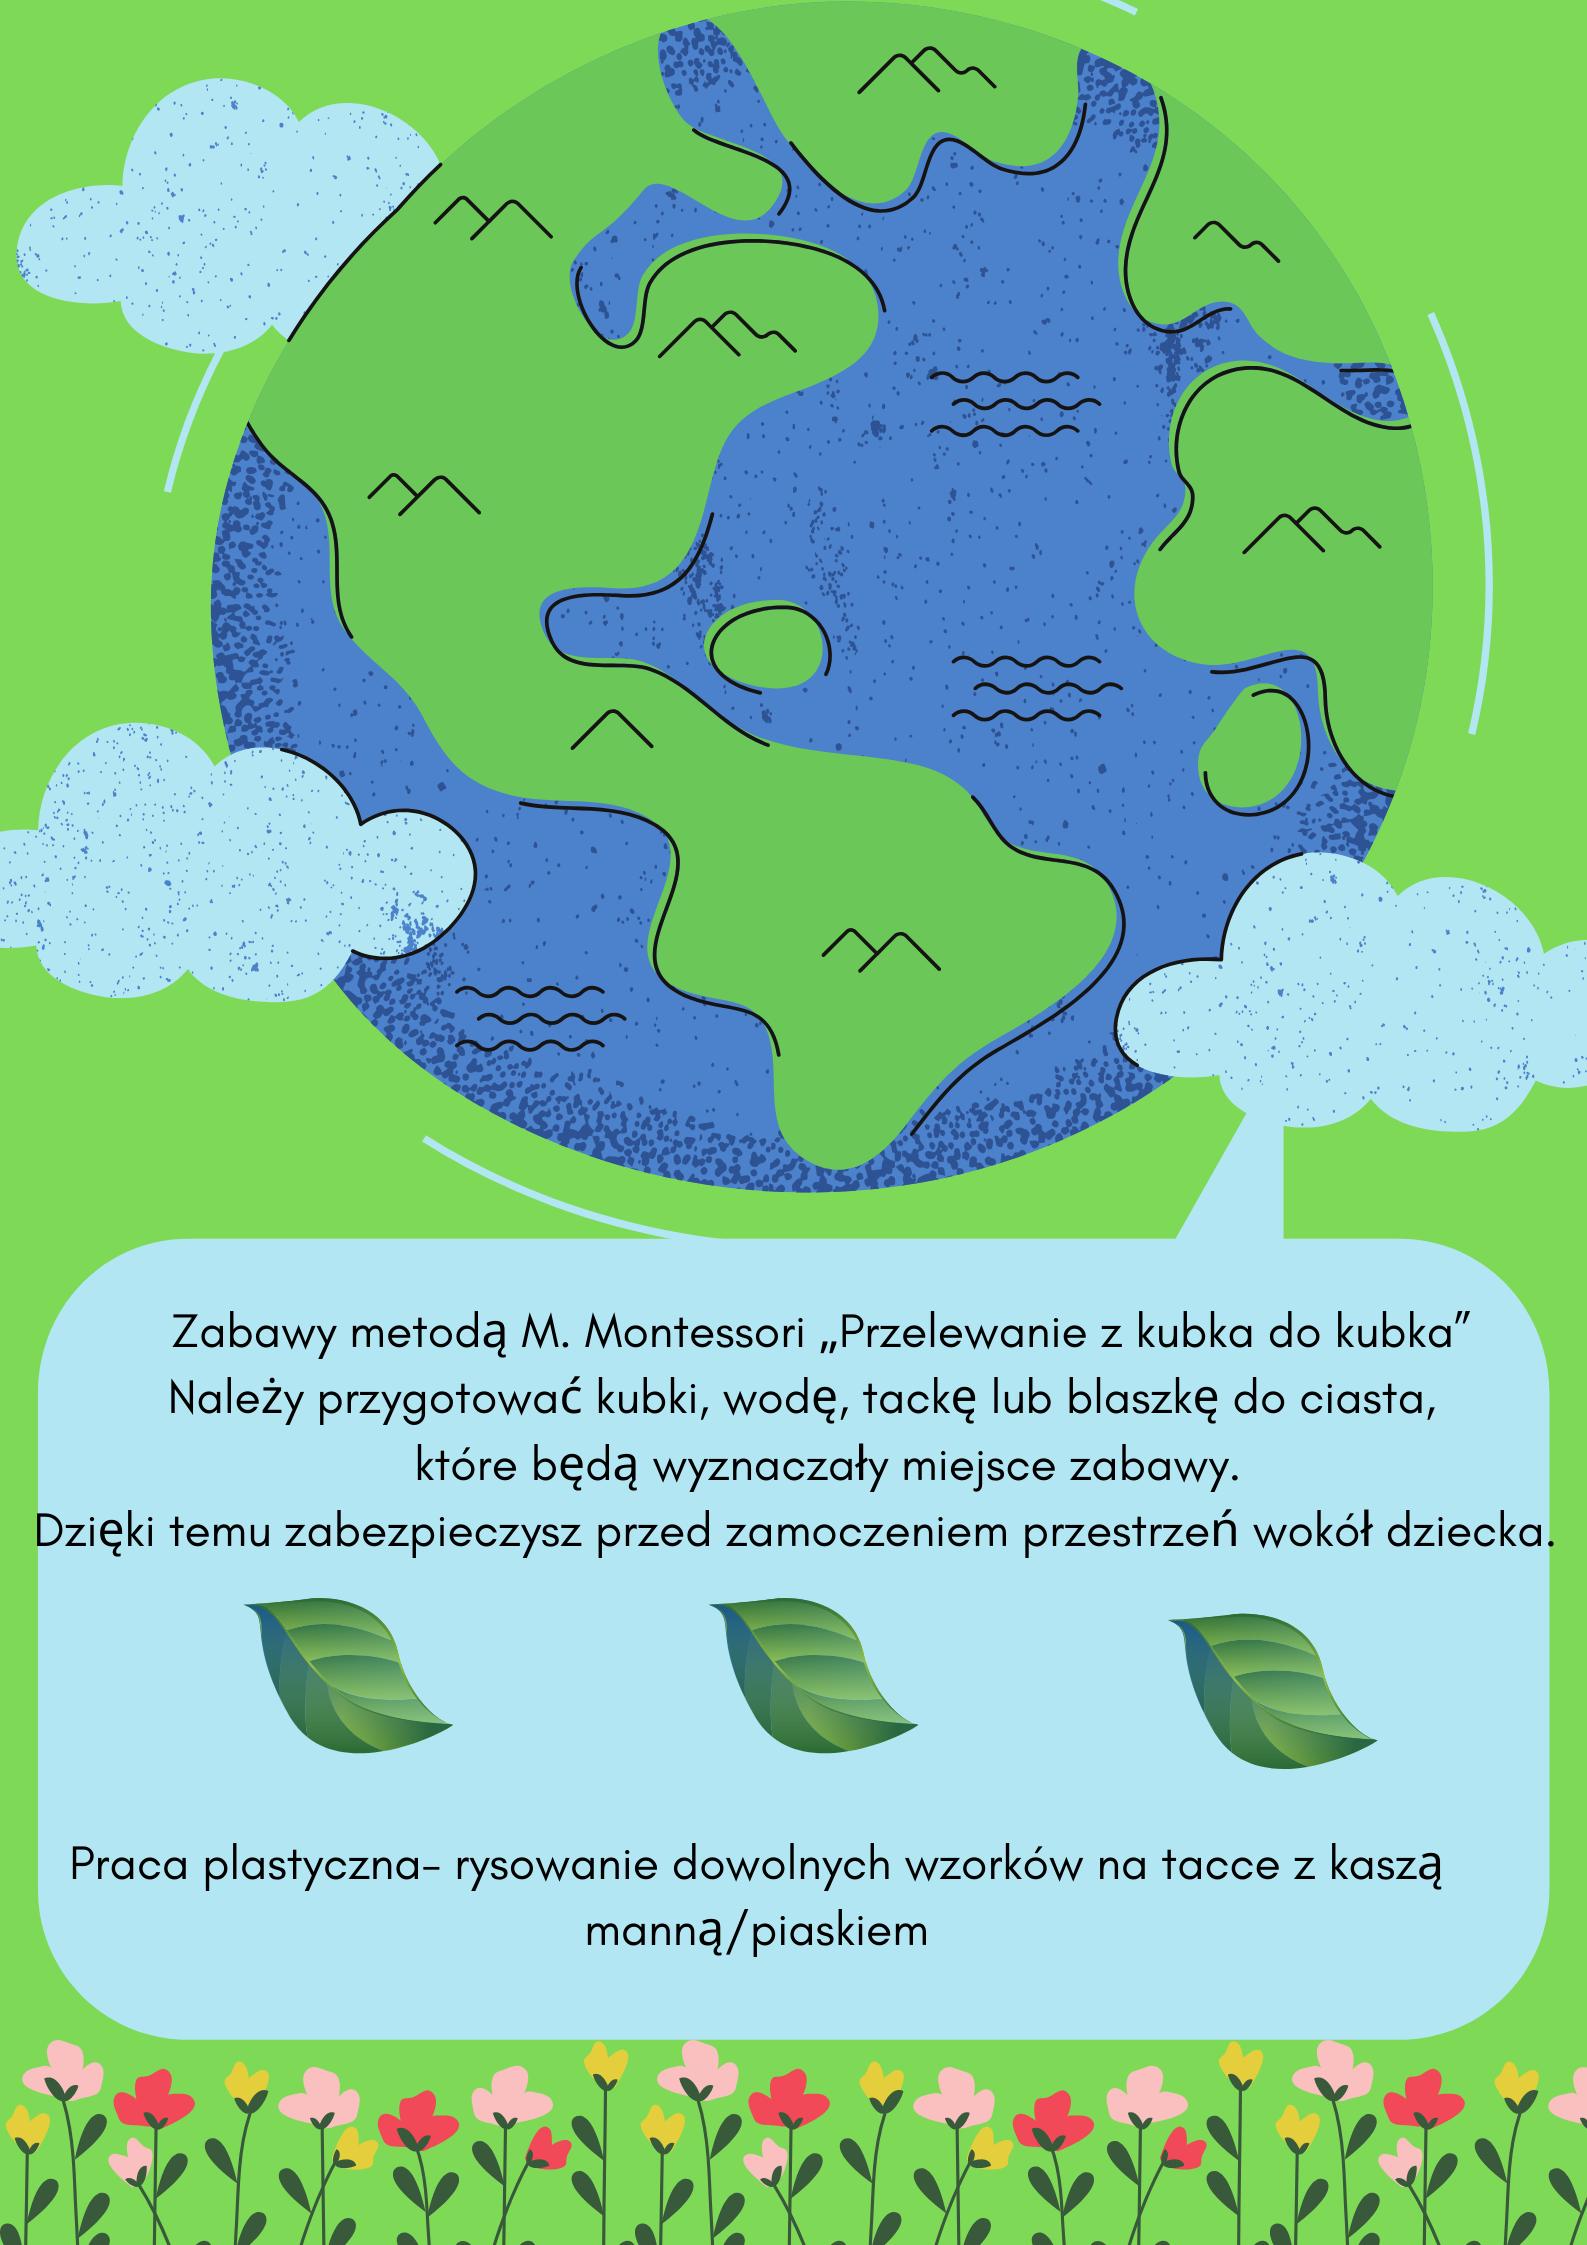 ekologia 5.png